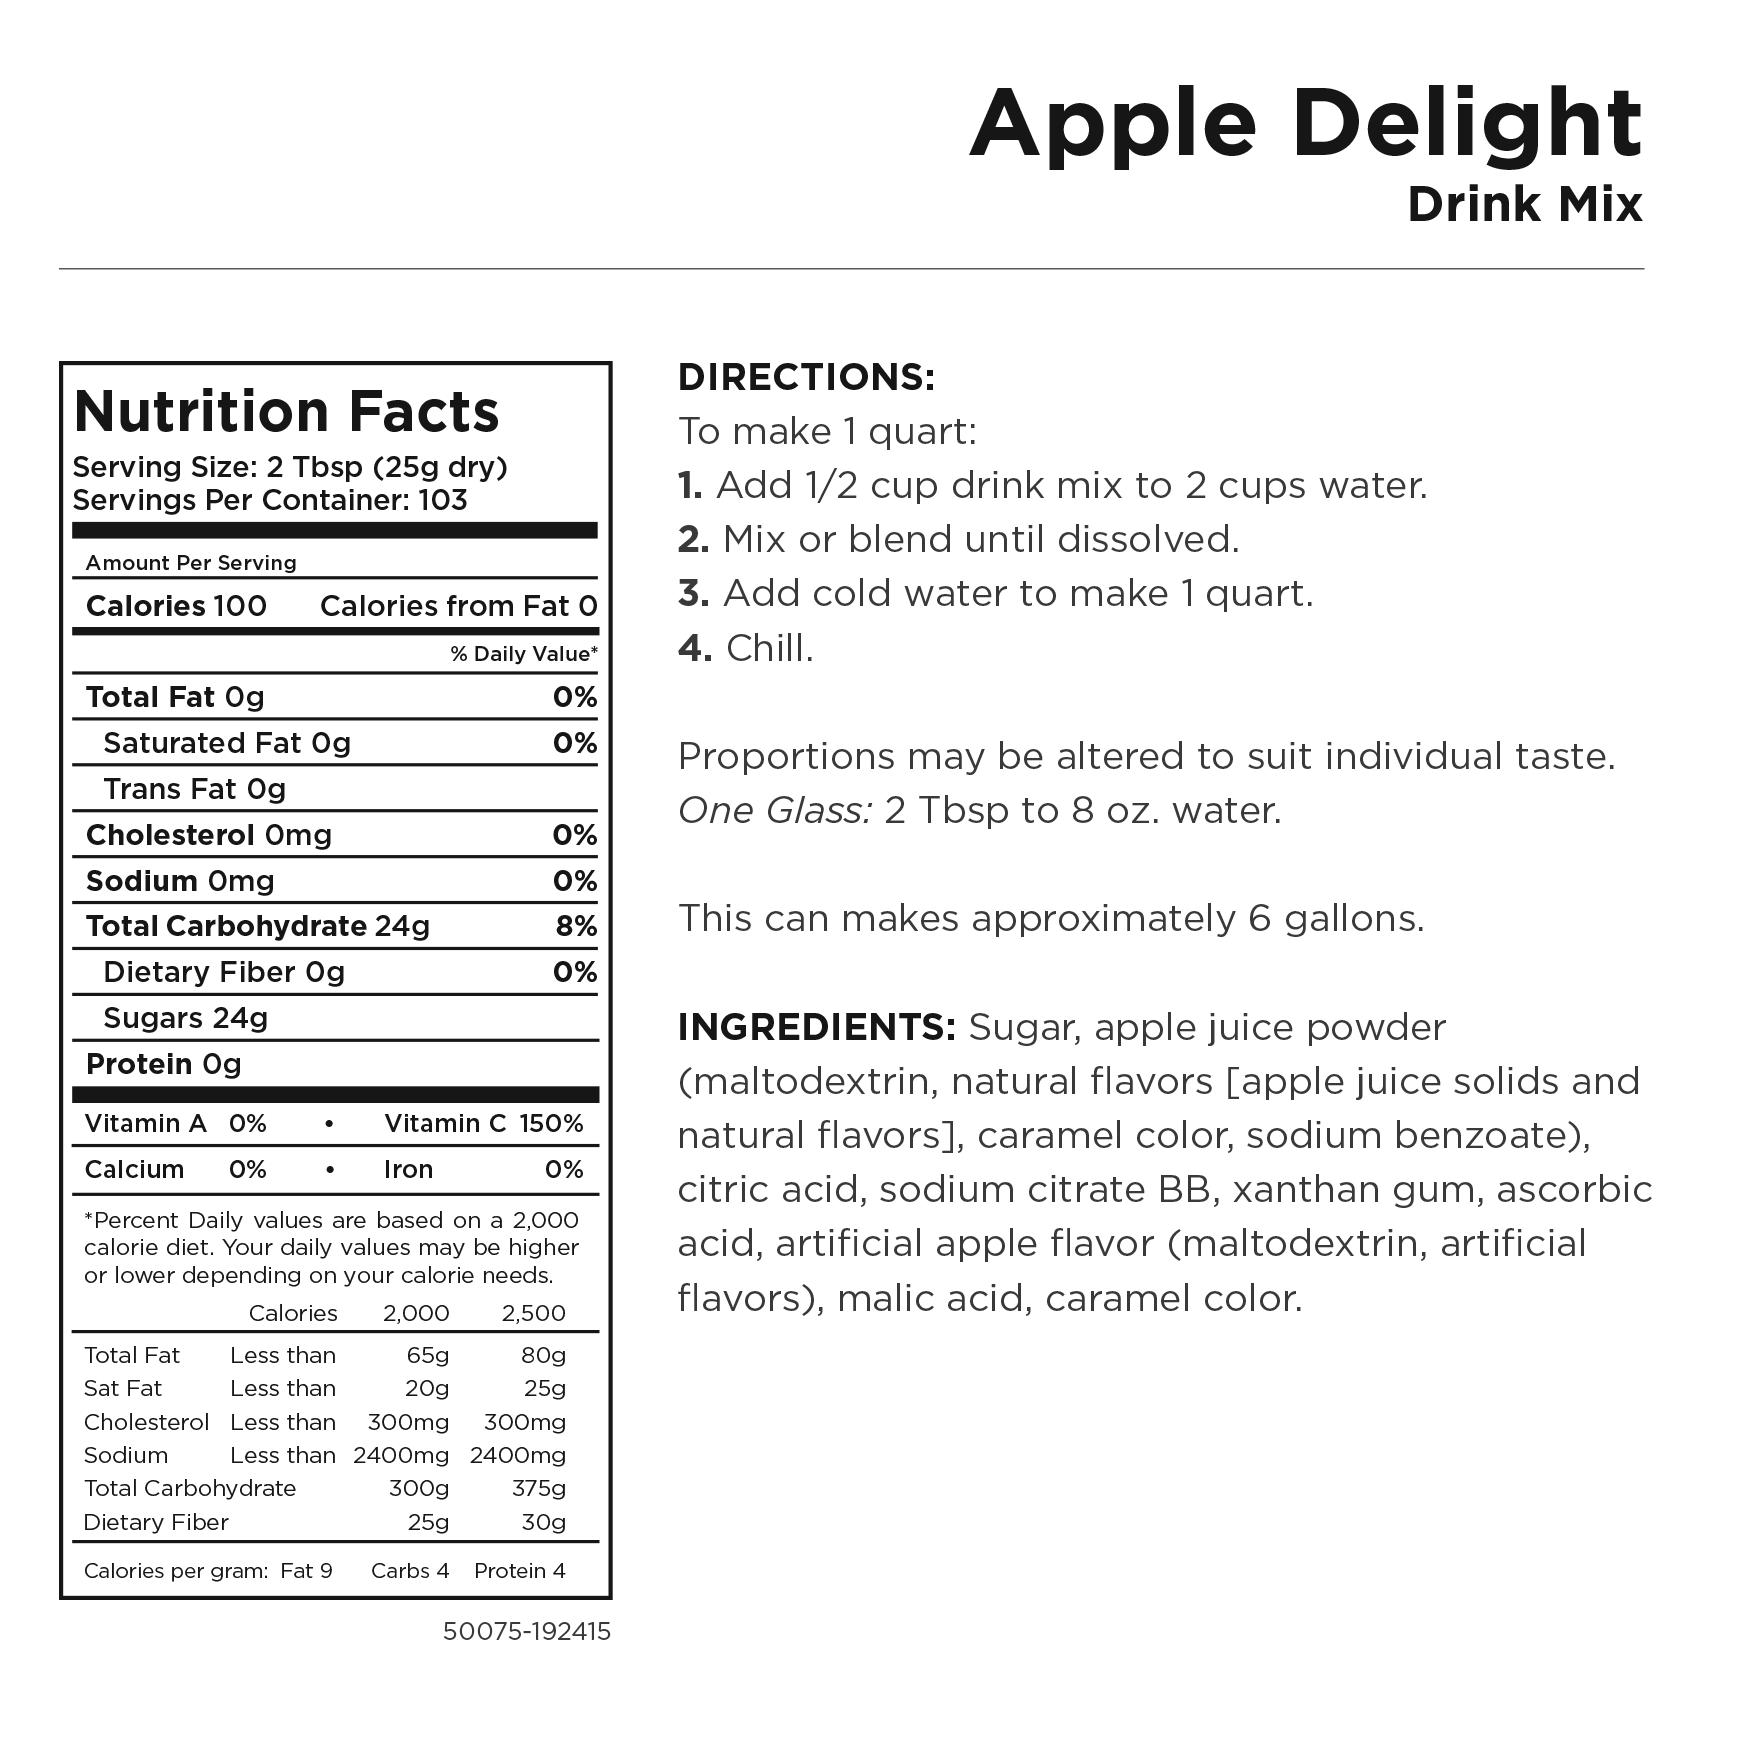 apple-delight-nut-panel